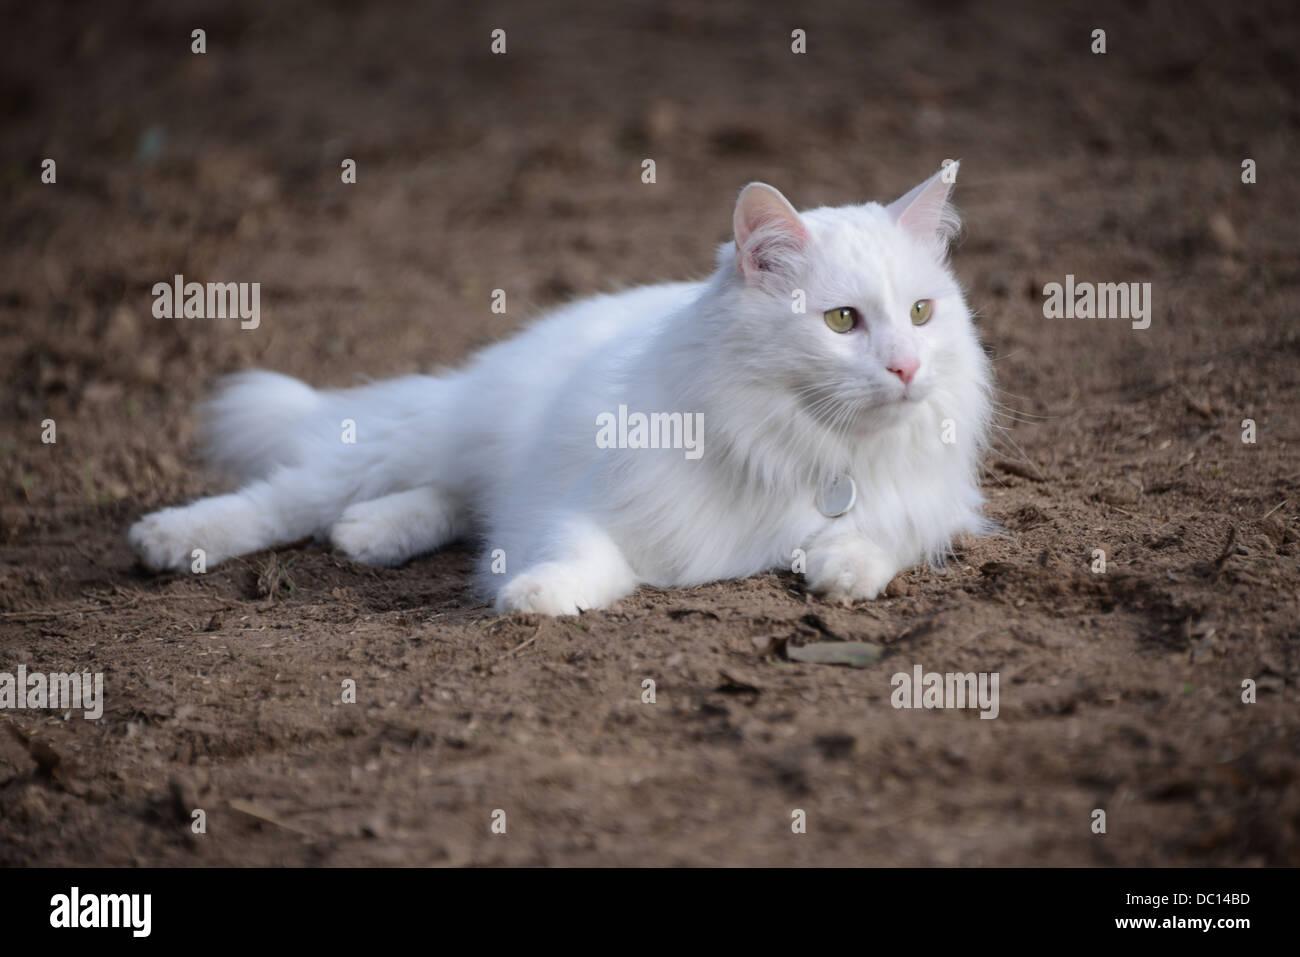 White Cat Fluffy Turkish Angora Cat Champion Pedigree Lying On Stock